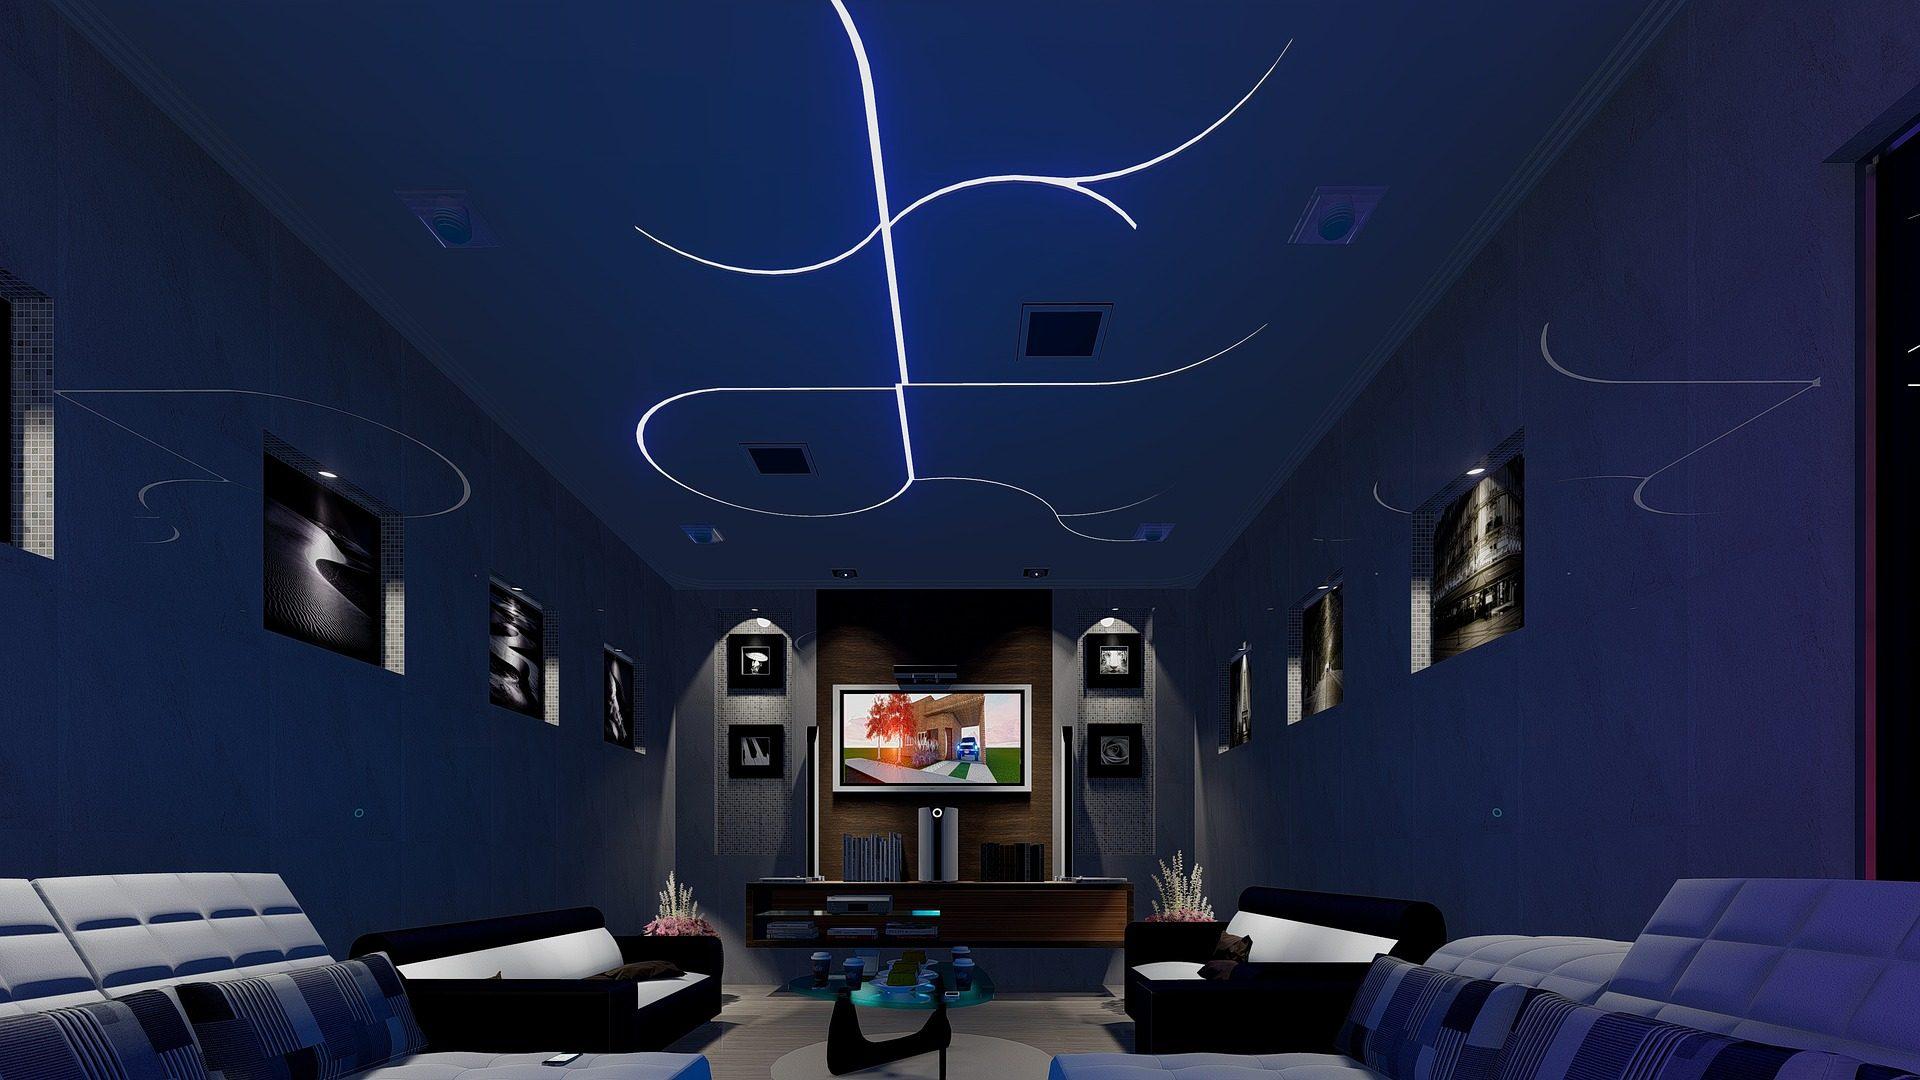 habitación, quarto, Sala de estar, estadia, moderna, futurista - Papéis de parede HD - Professor-falken.com